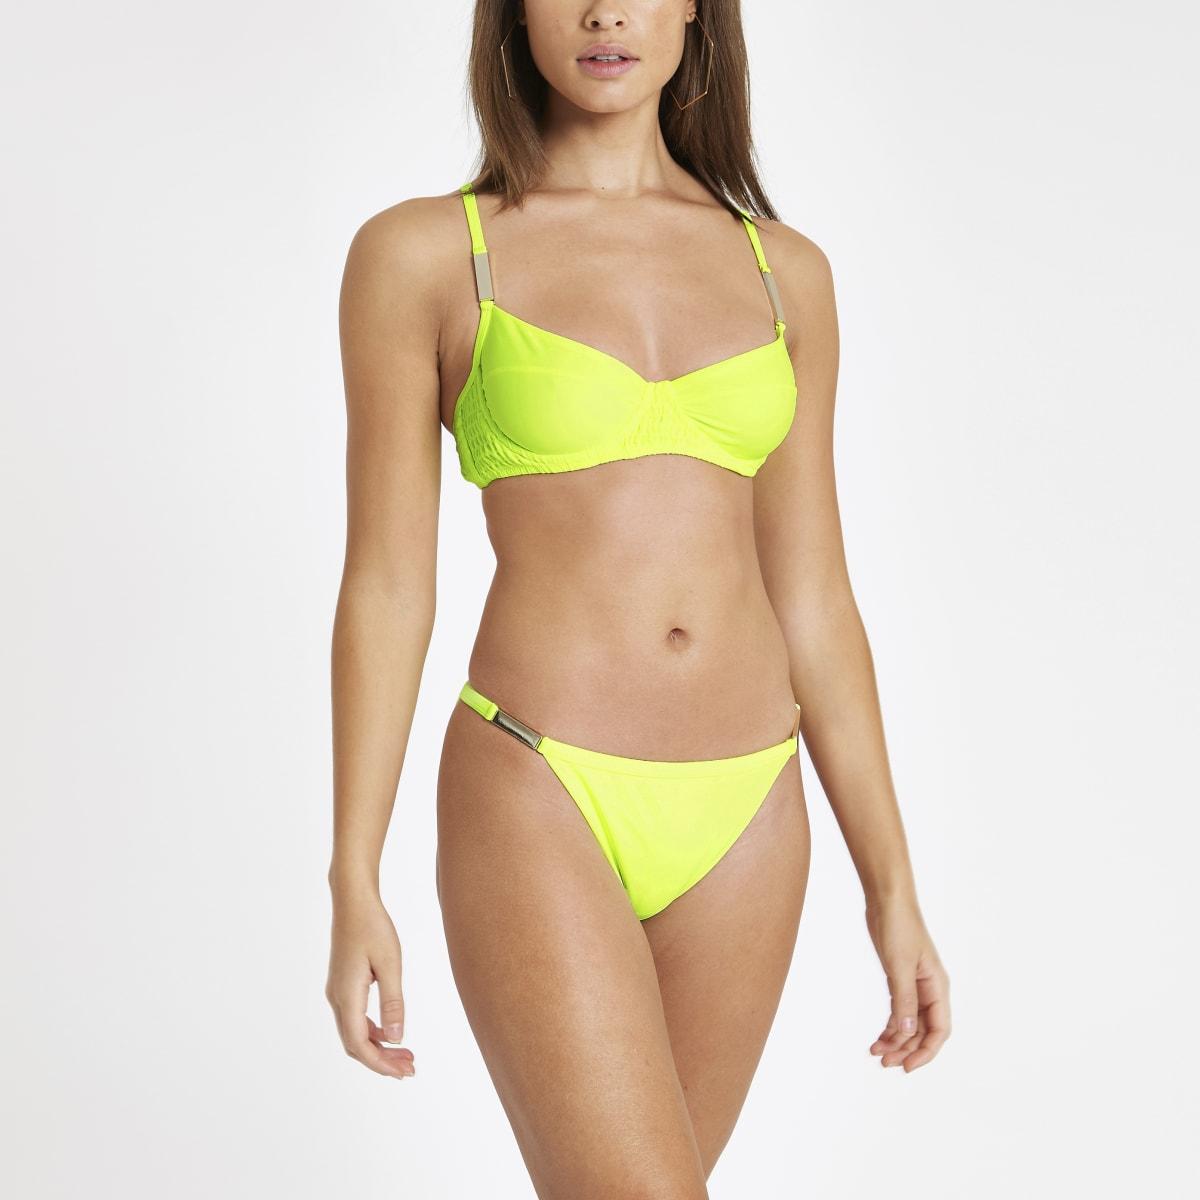 Bright yellow high leg bikini bottoms